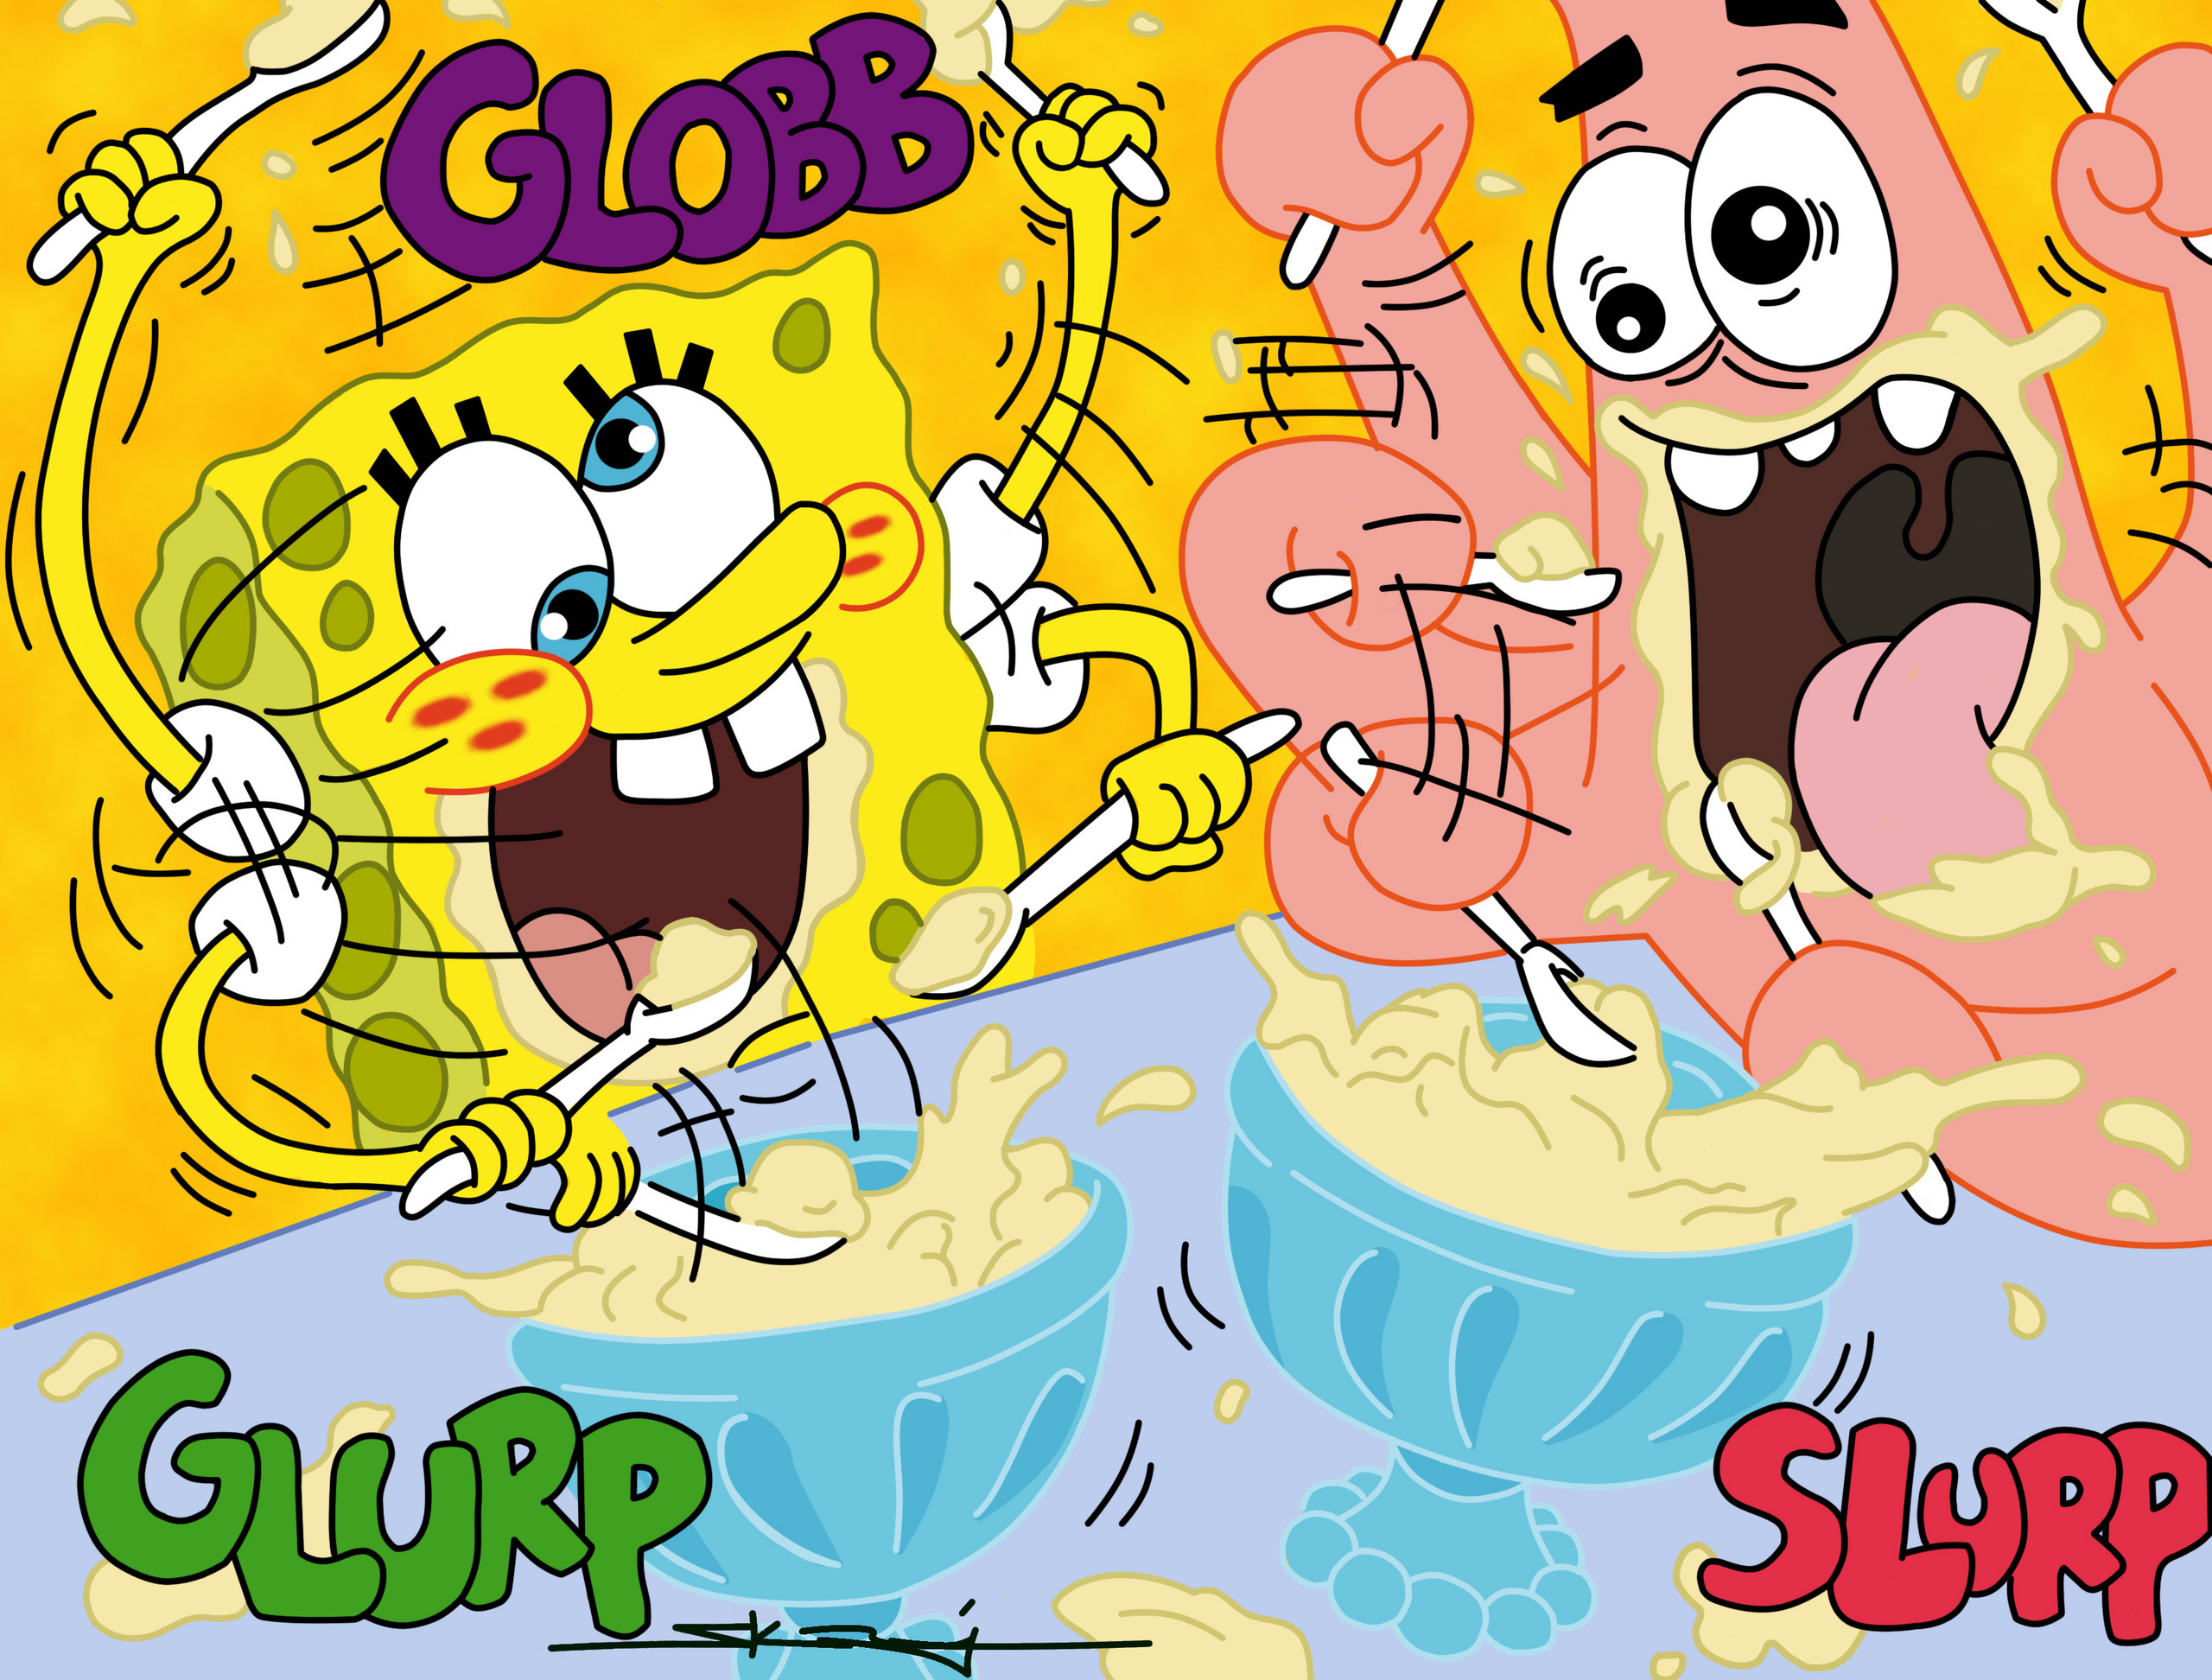 Are You Spongebob Or Patrick?